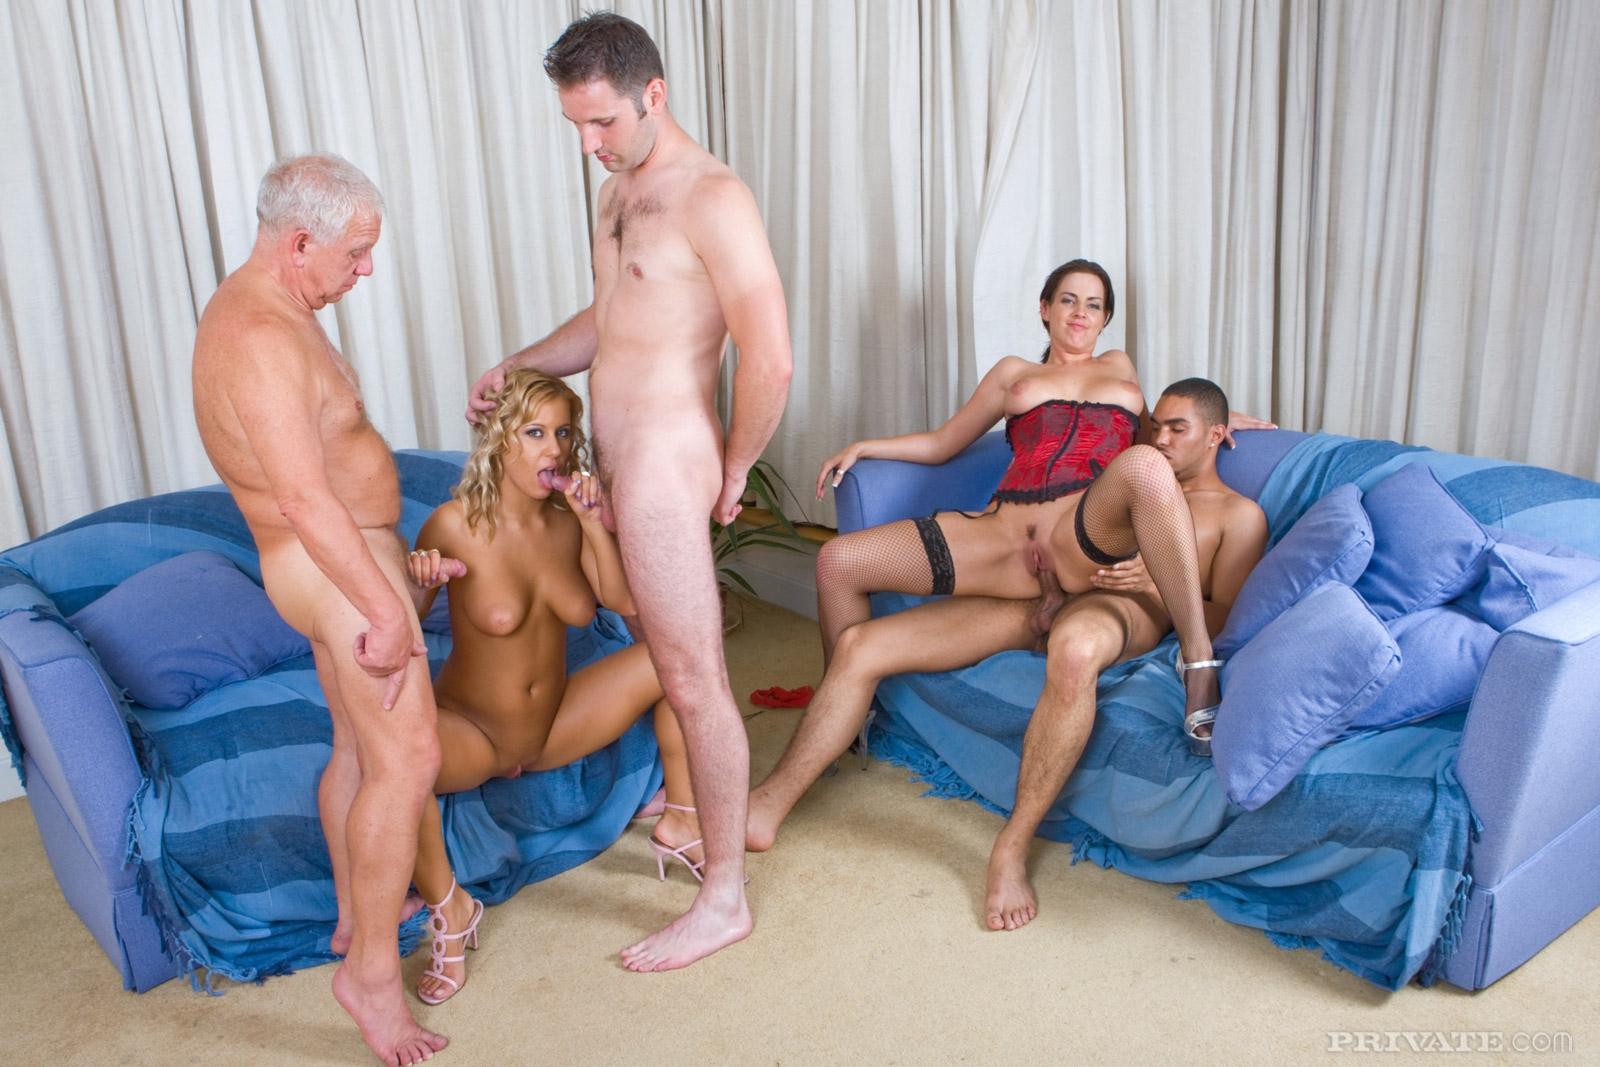 English sex fuck images pics xxx film